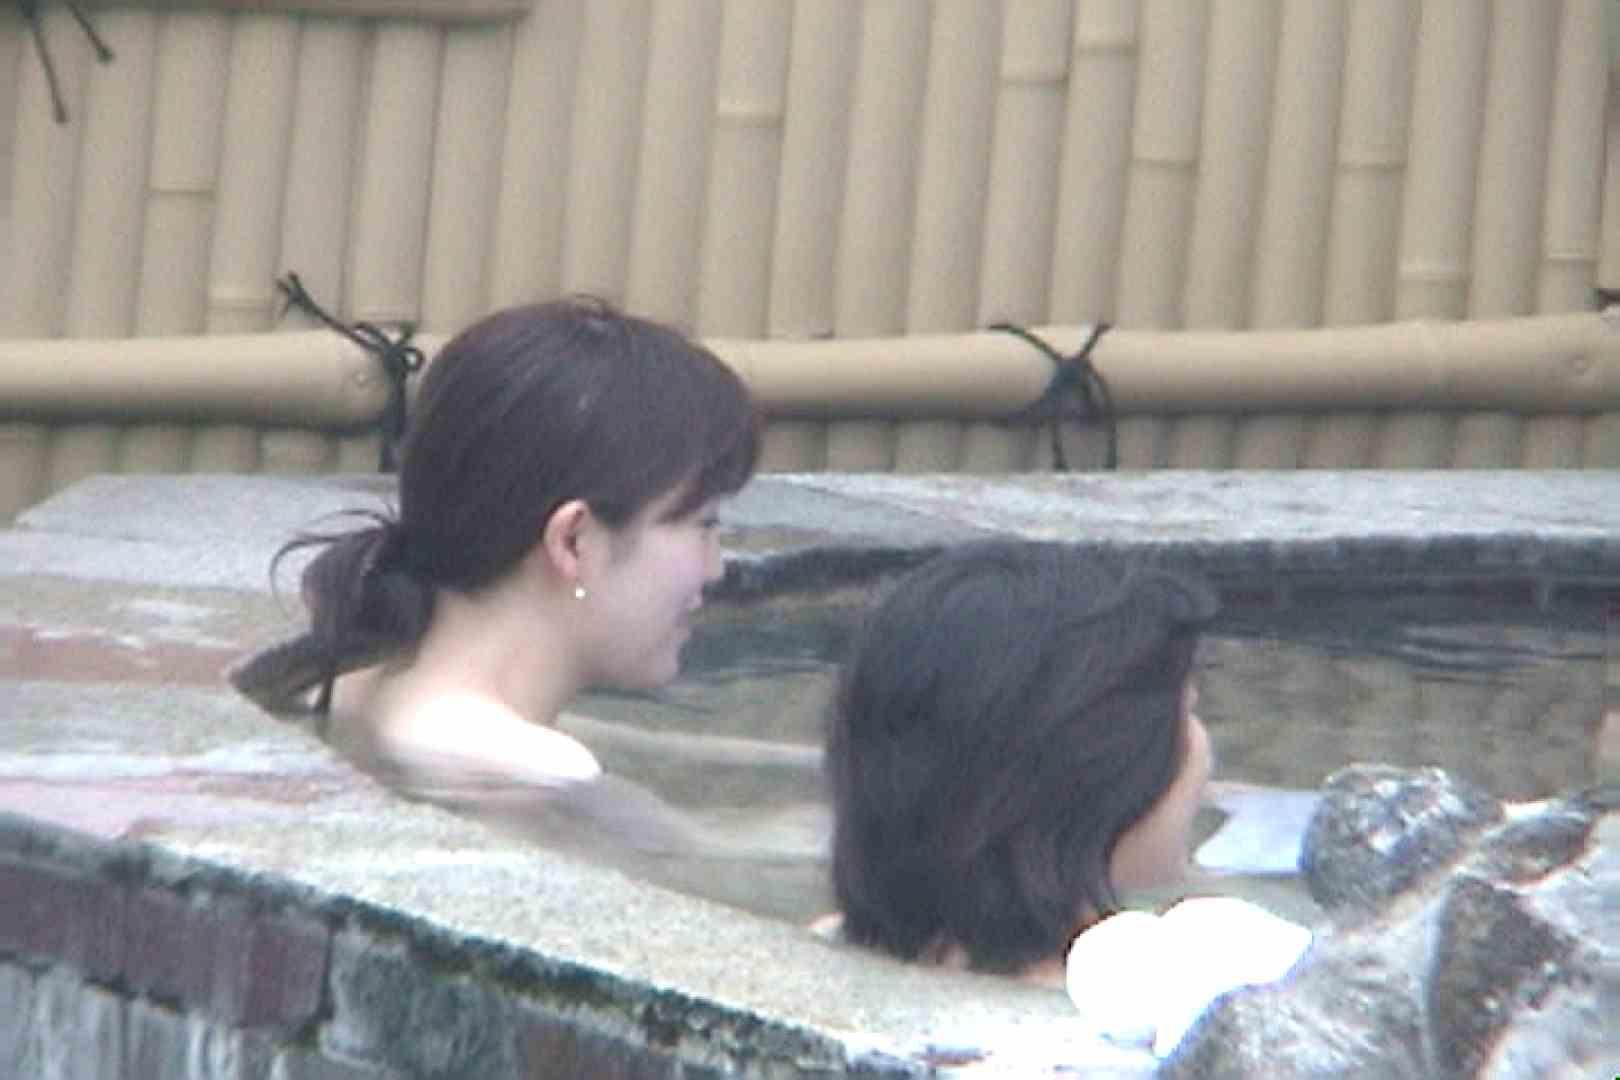 Aquaな露天風呂Vol.79【VIP限定】 盗撮 | HなOL  100pic 100